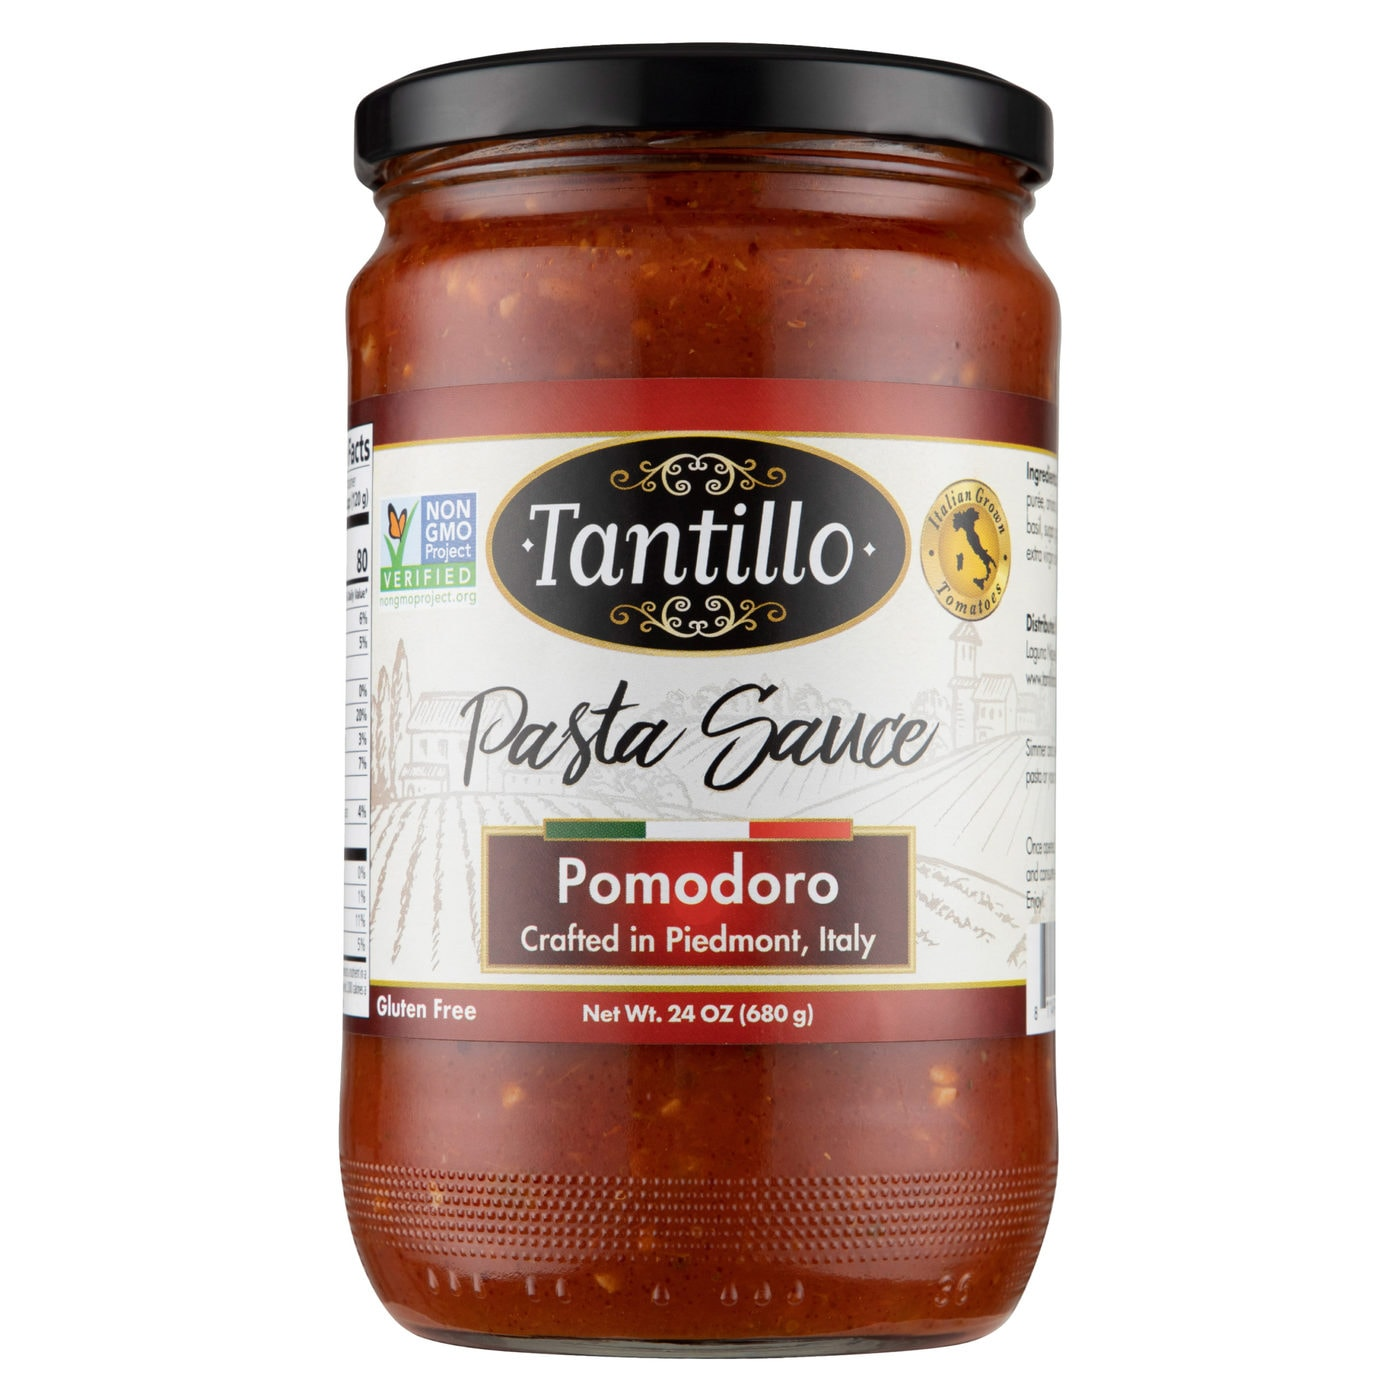 Tantillo Imported Italian Pomodoro Pasta Sauce 24oz (Pack of 2)